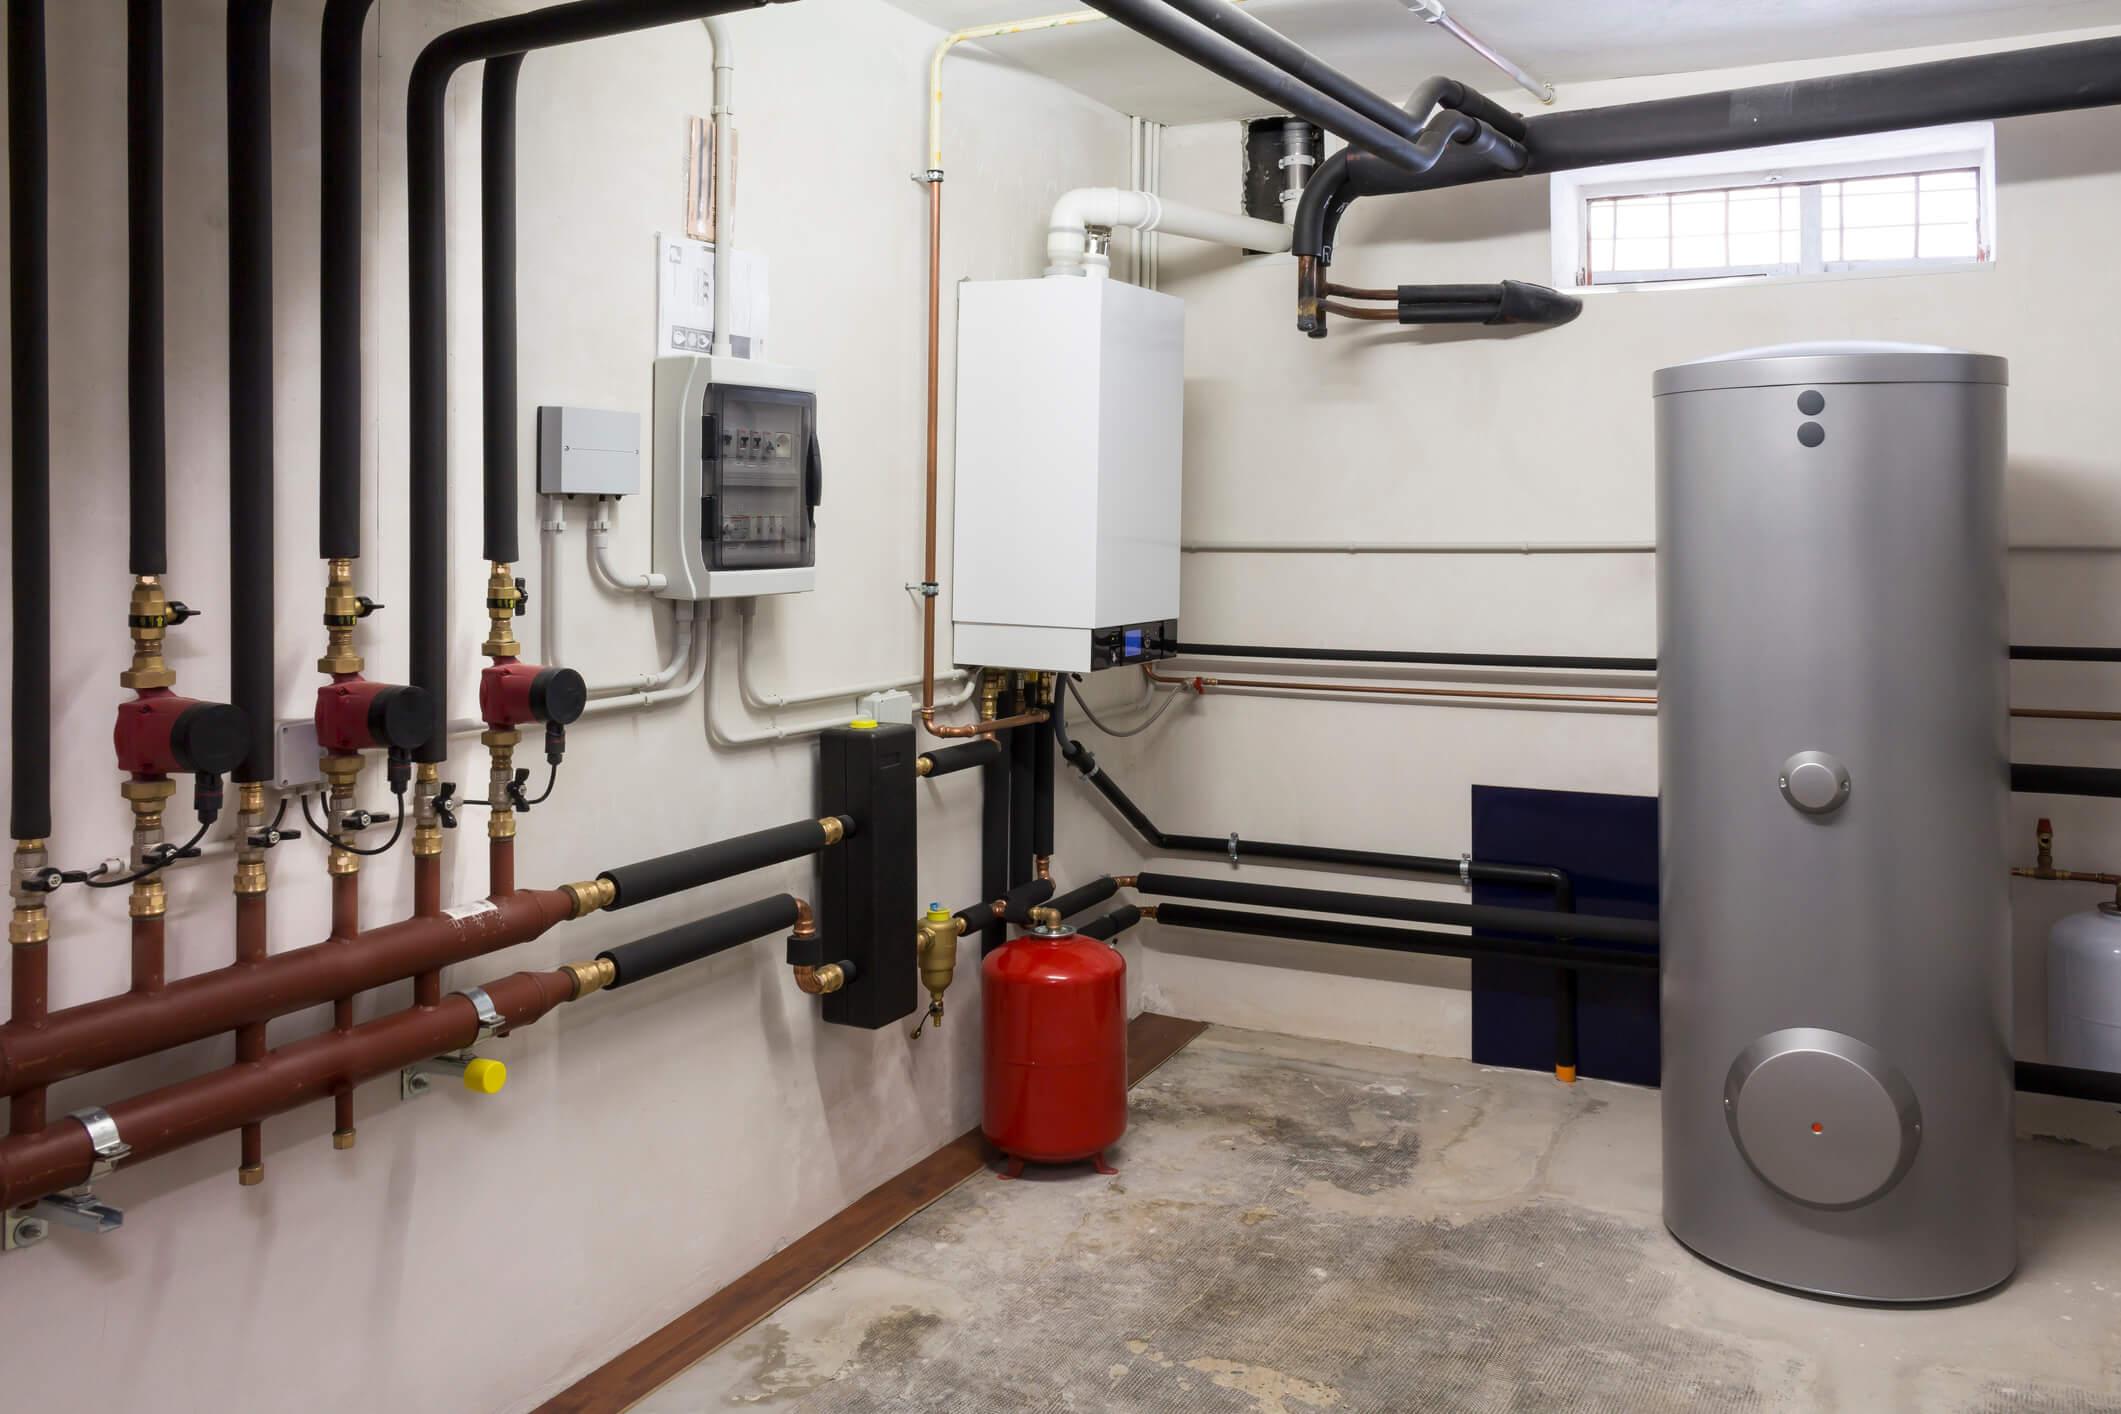 condensing water heater in boiler room